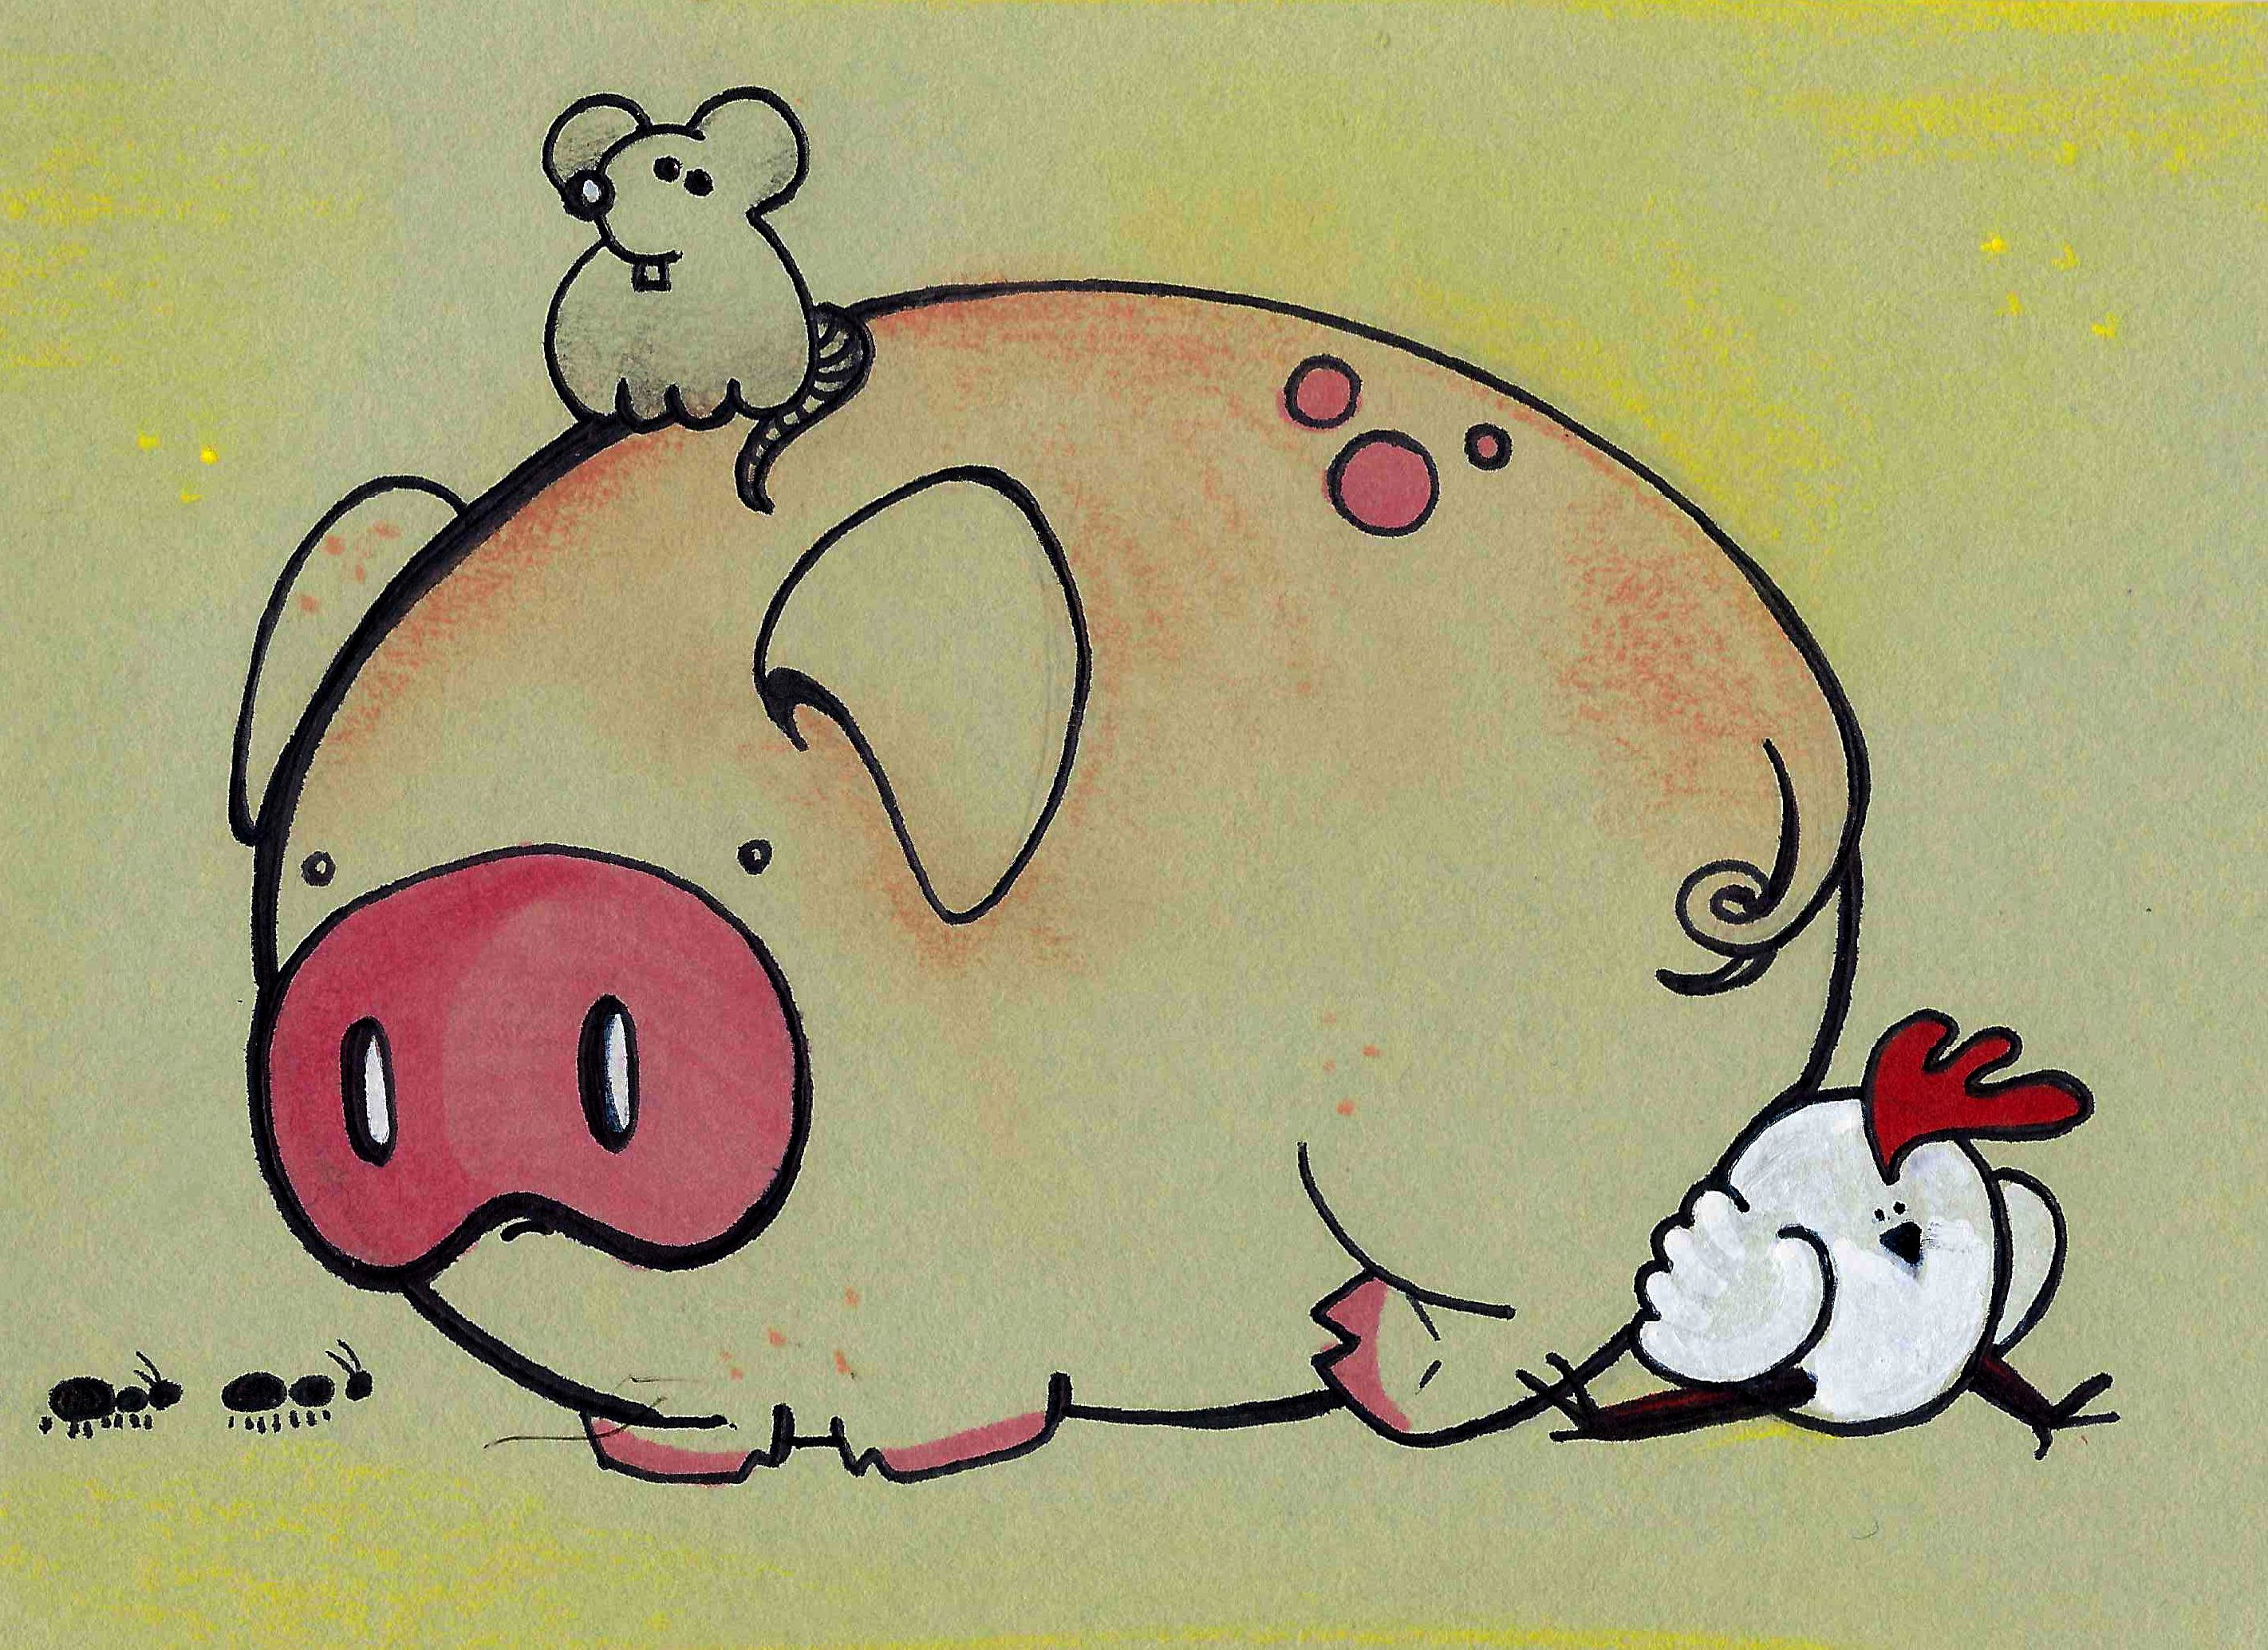 cute pig and friends illustration | curiositos :3 | Pinterest | Cerdo